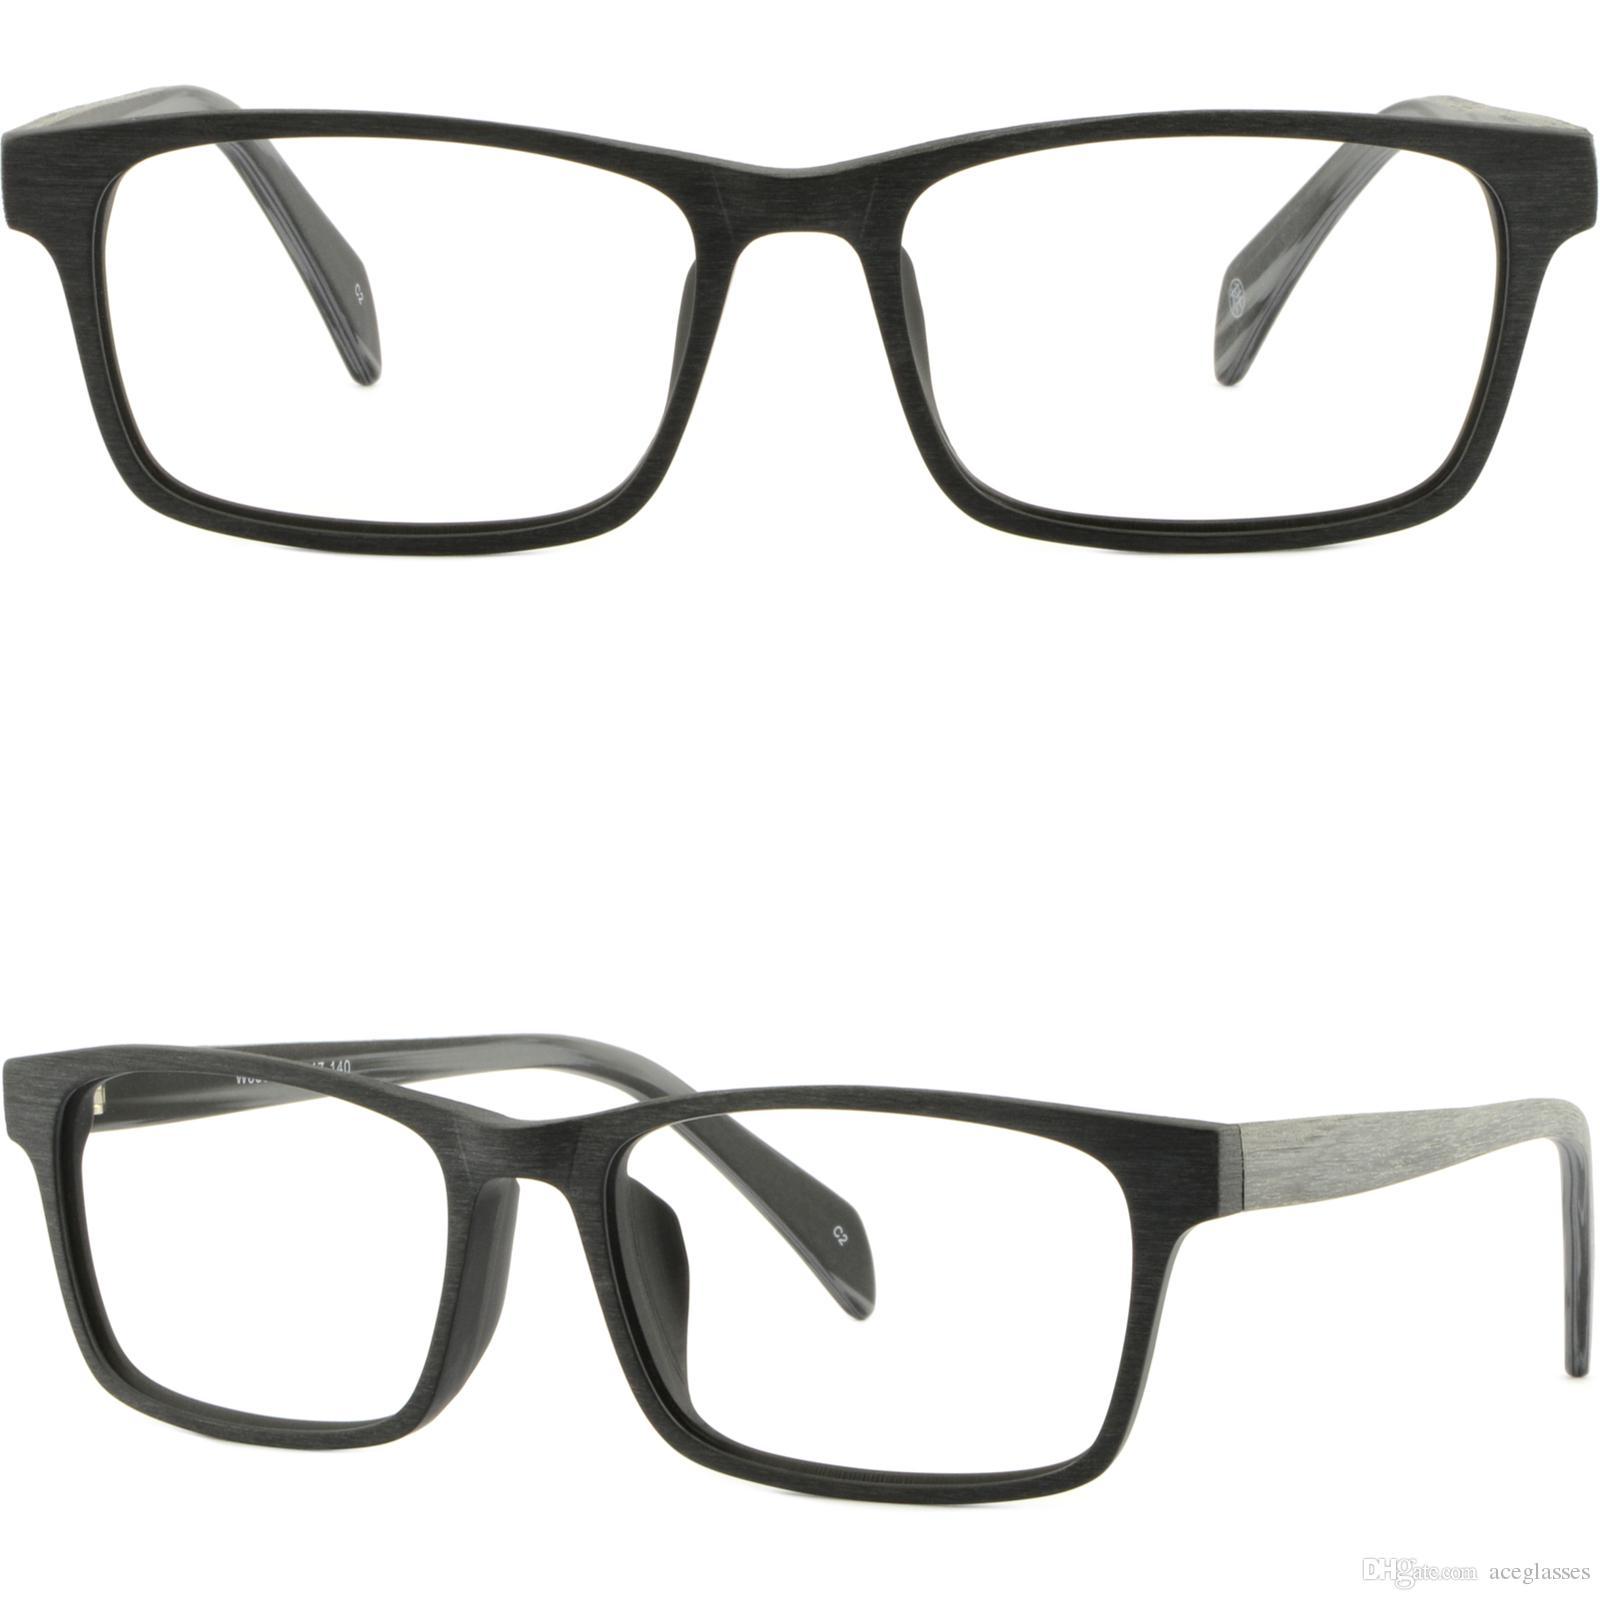 ce3bdb3a020 Brillenfassung Light Men S Women S Frame Plastic Glasses Eyeglasses  Rectangle Acetate Black Wood Imitation Brand Name Eyeglass Frames Carolee  Eyeglass ...